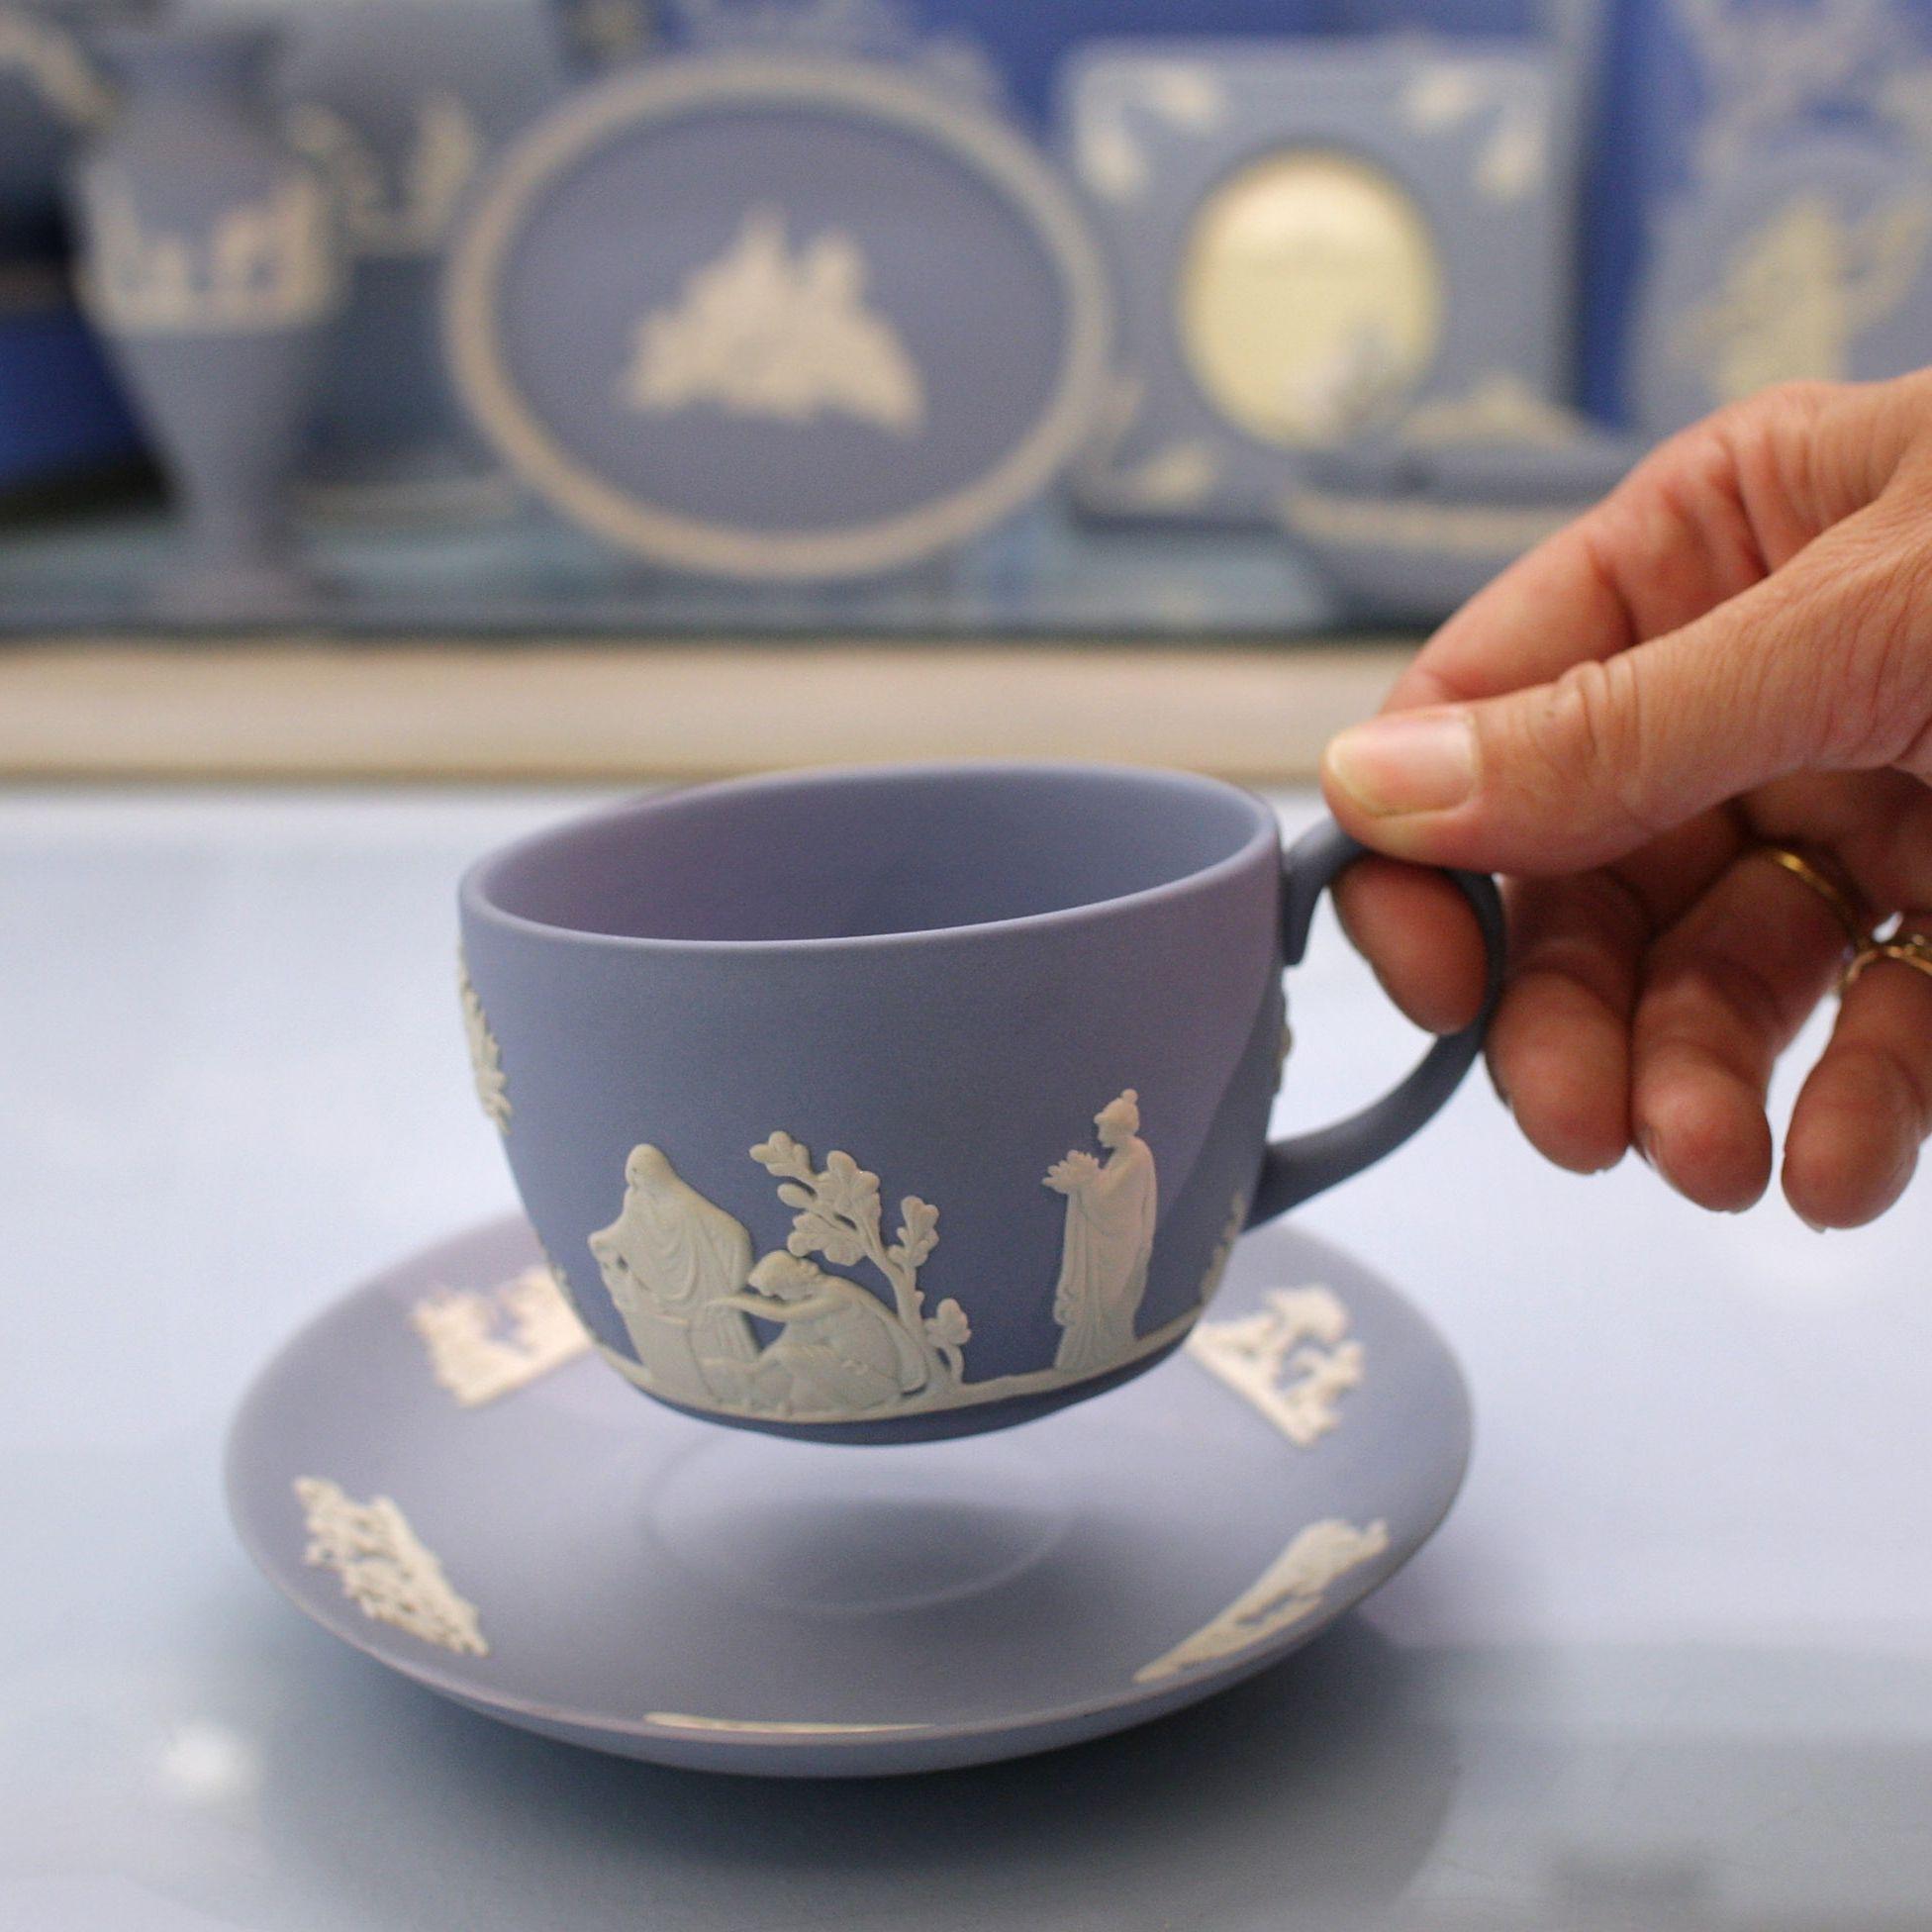 Introduction to Wedgwood Ceramics